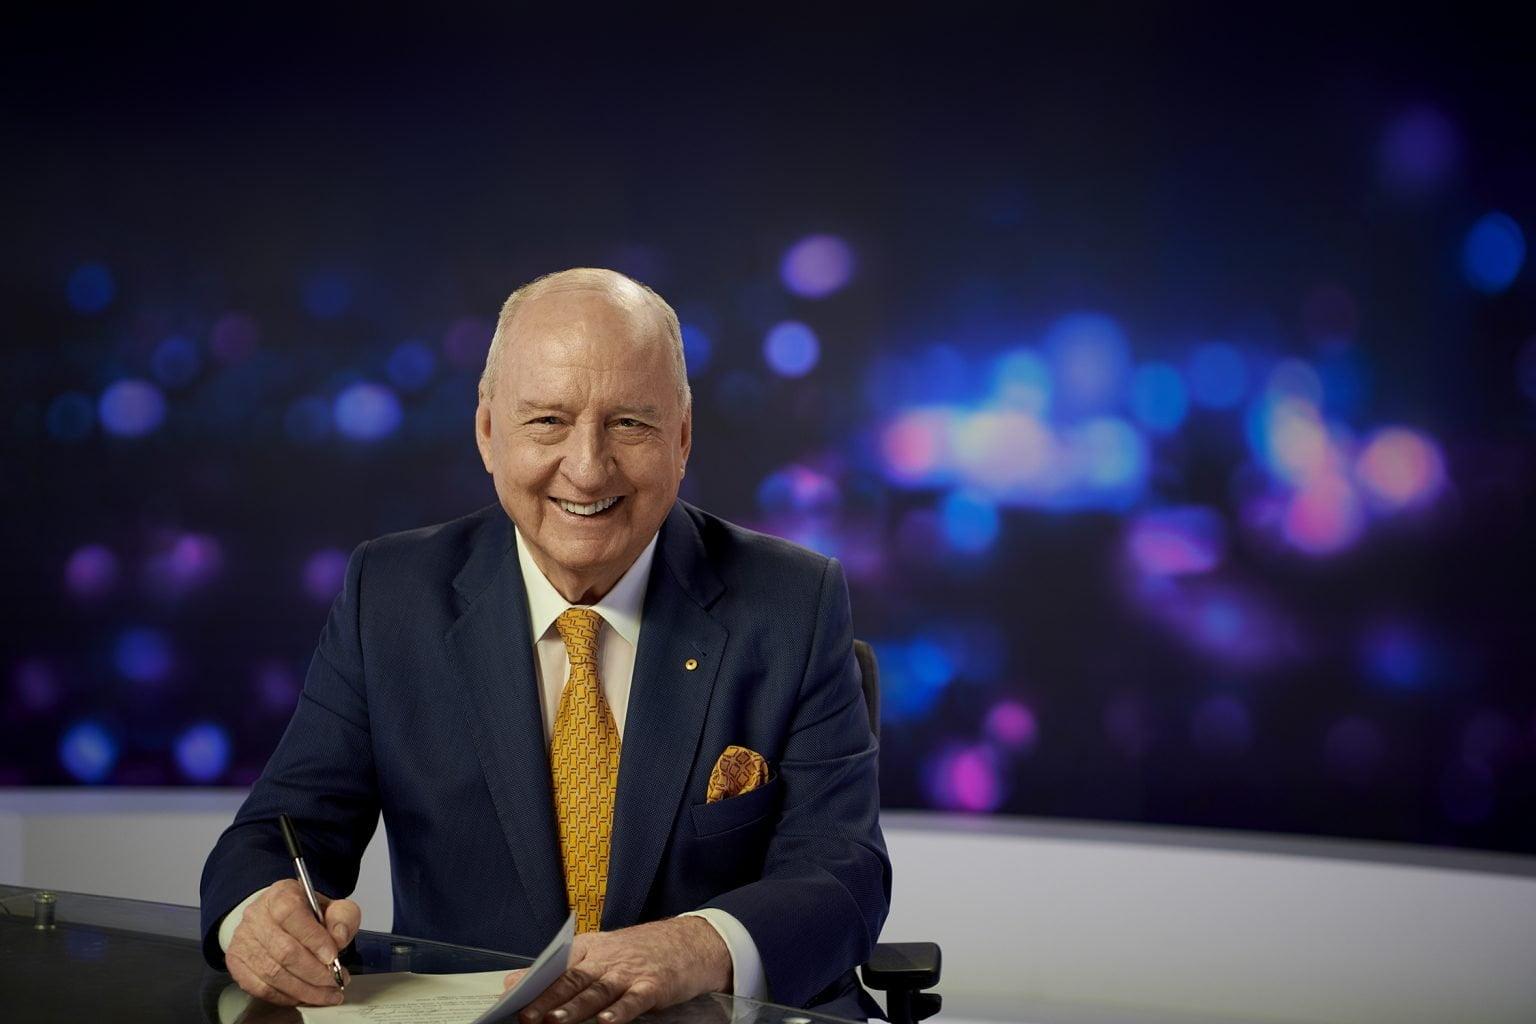 Alan-Jones_-Sky-News-Australia_-Image-Credit-Sky-News-1536x1024